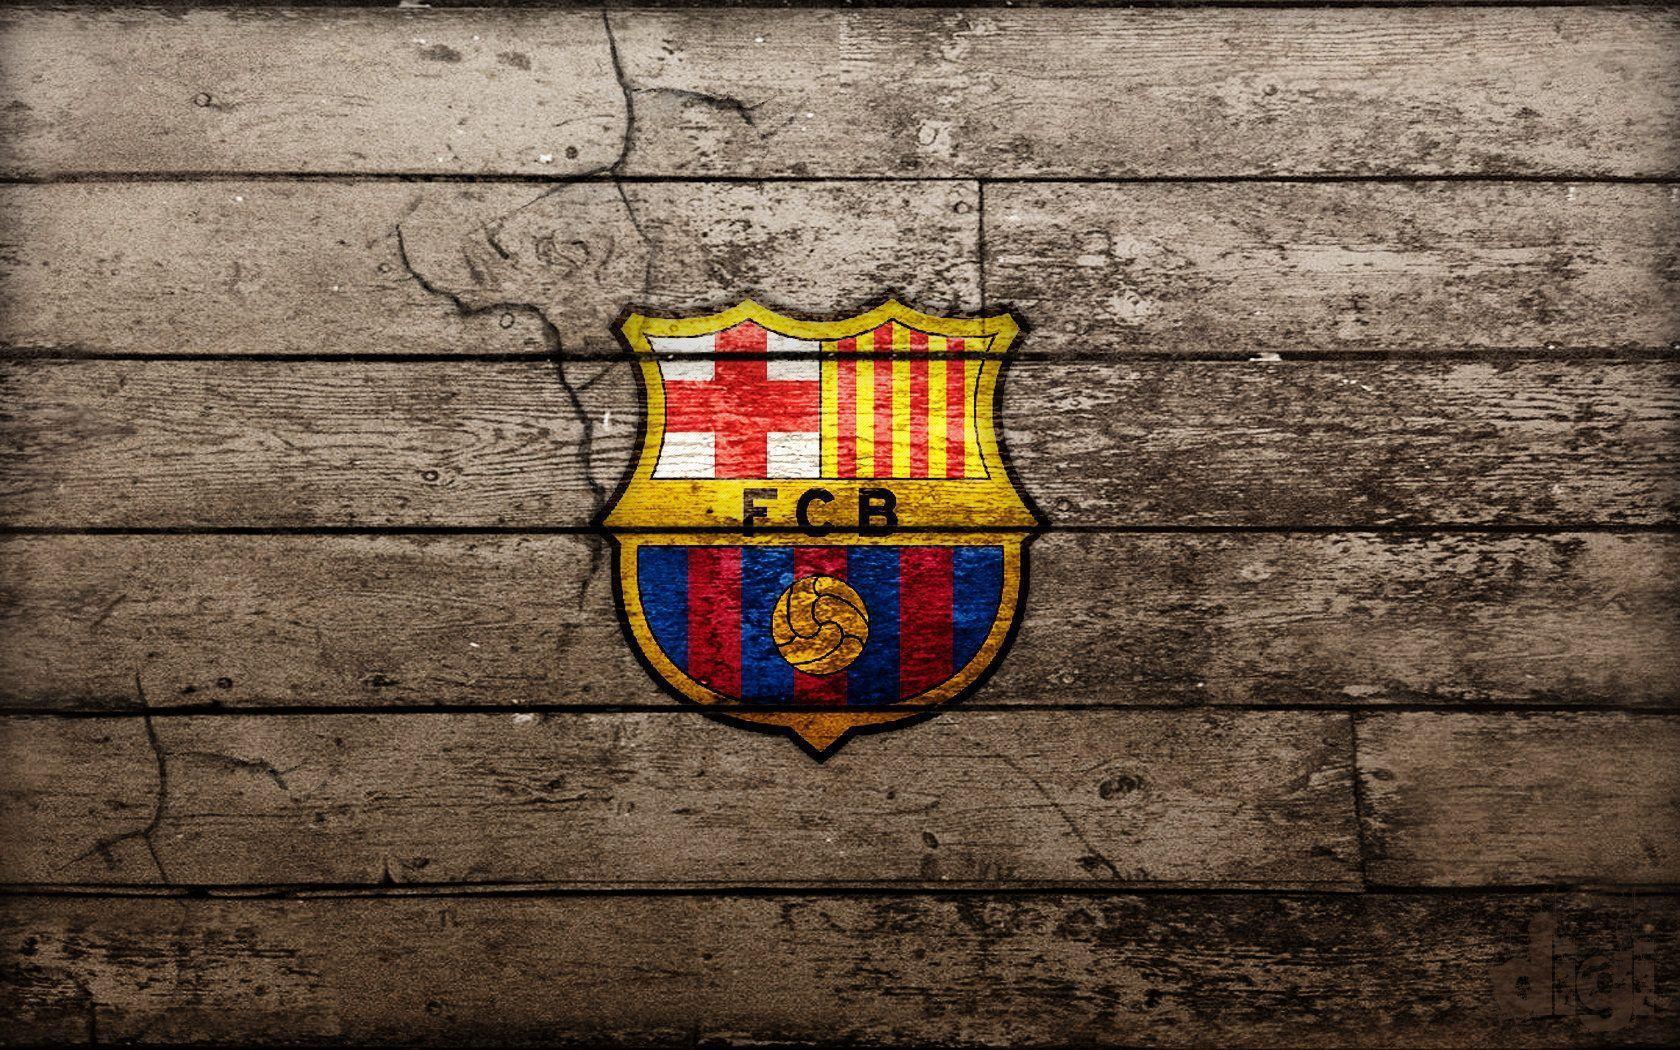 Muchos Wallpapers FC Barcelona [HD] !! - Taringa!